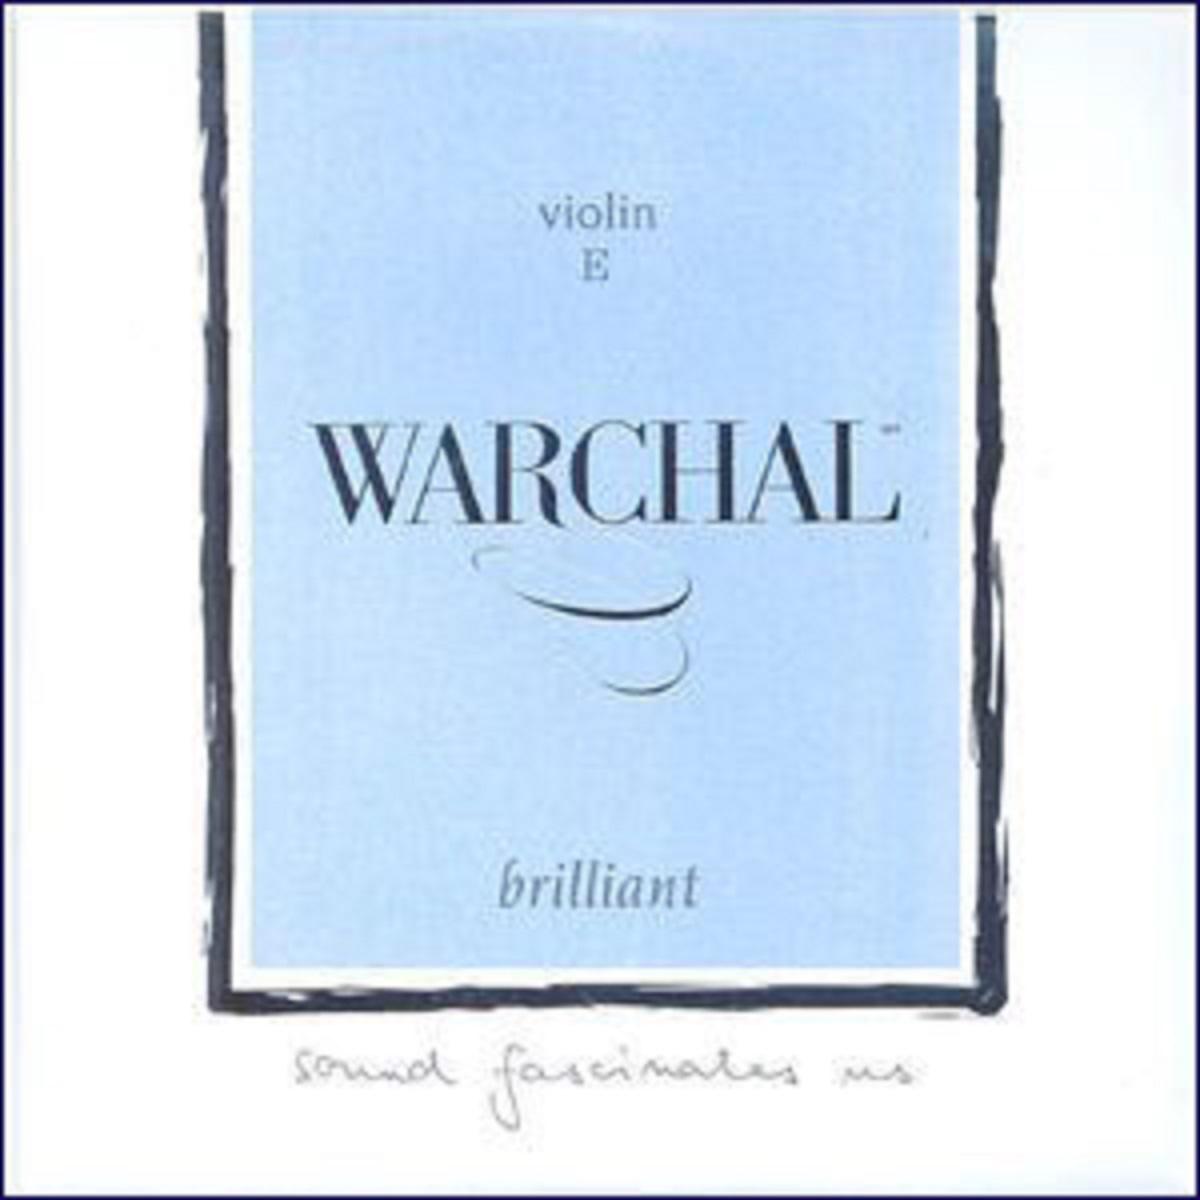 цена Струна E для скрипки Warchal Brilliant 901B онлайн в 2017 году